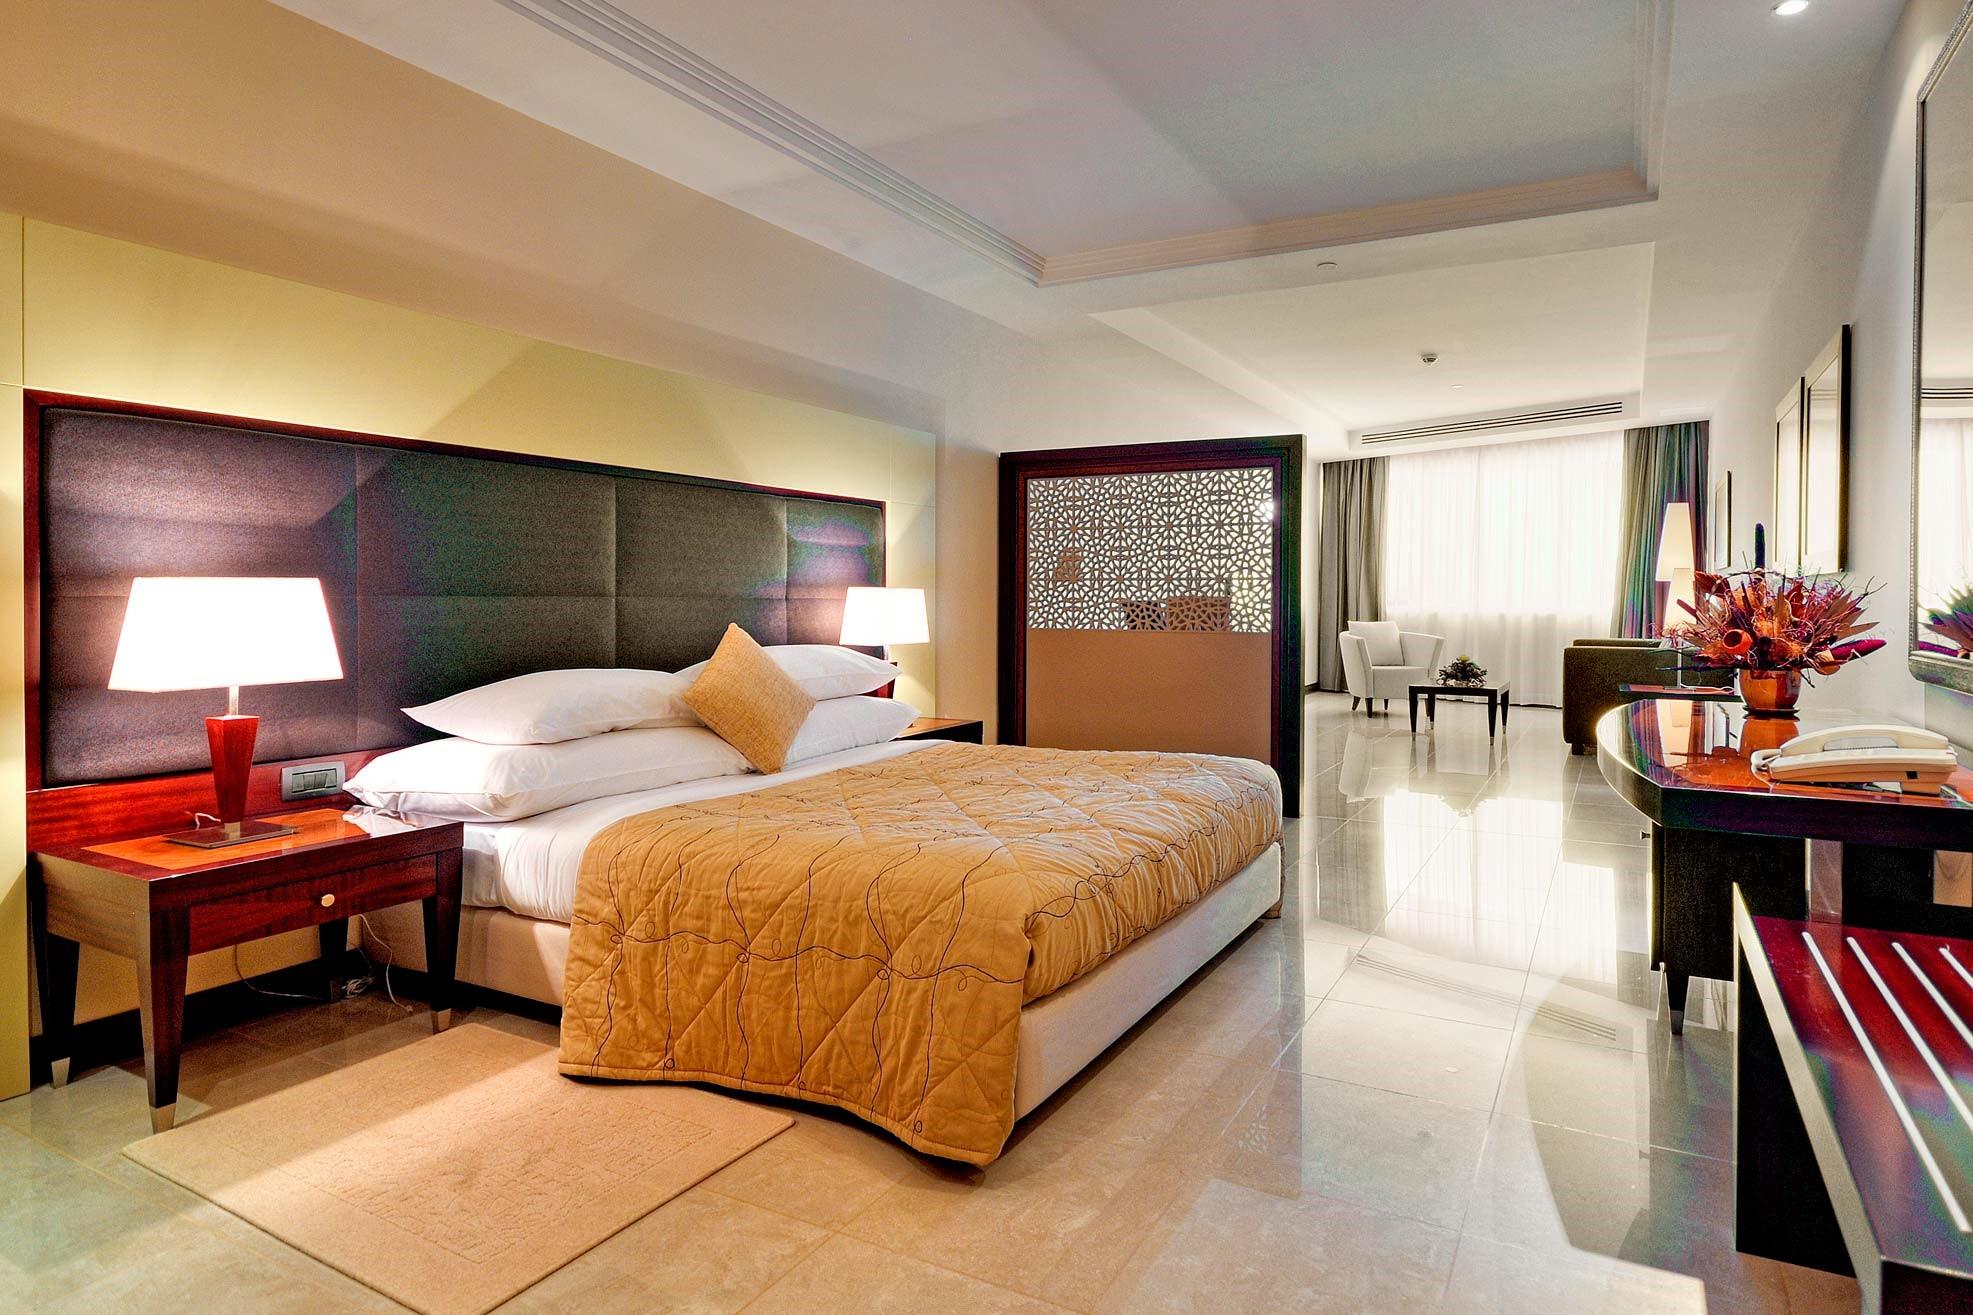 Executive Room Luxury Hotel Rooms In Khartoum Corinthia